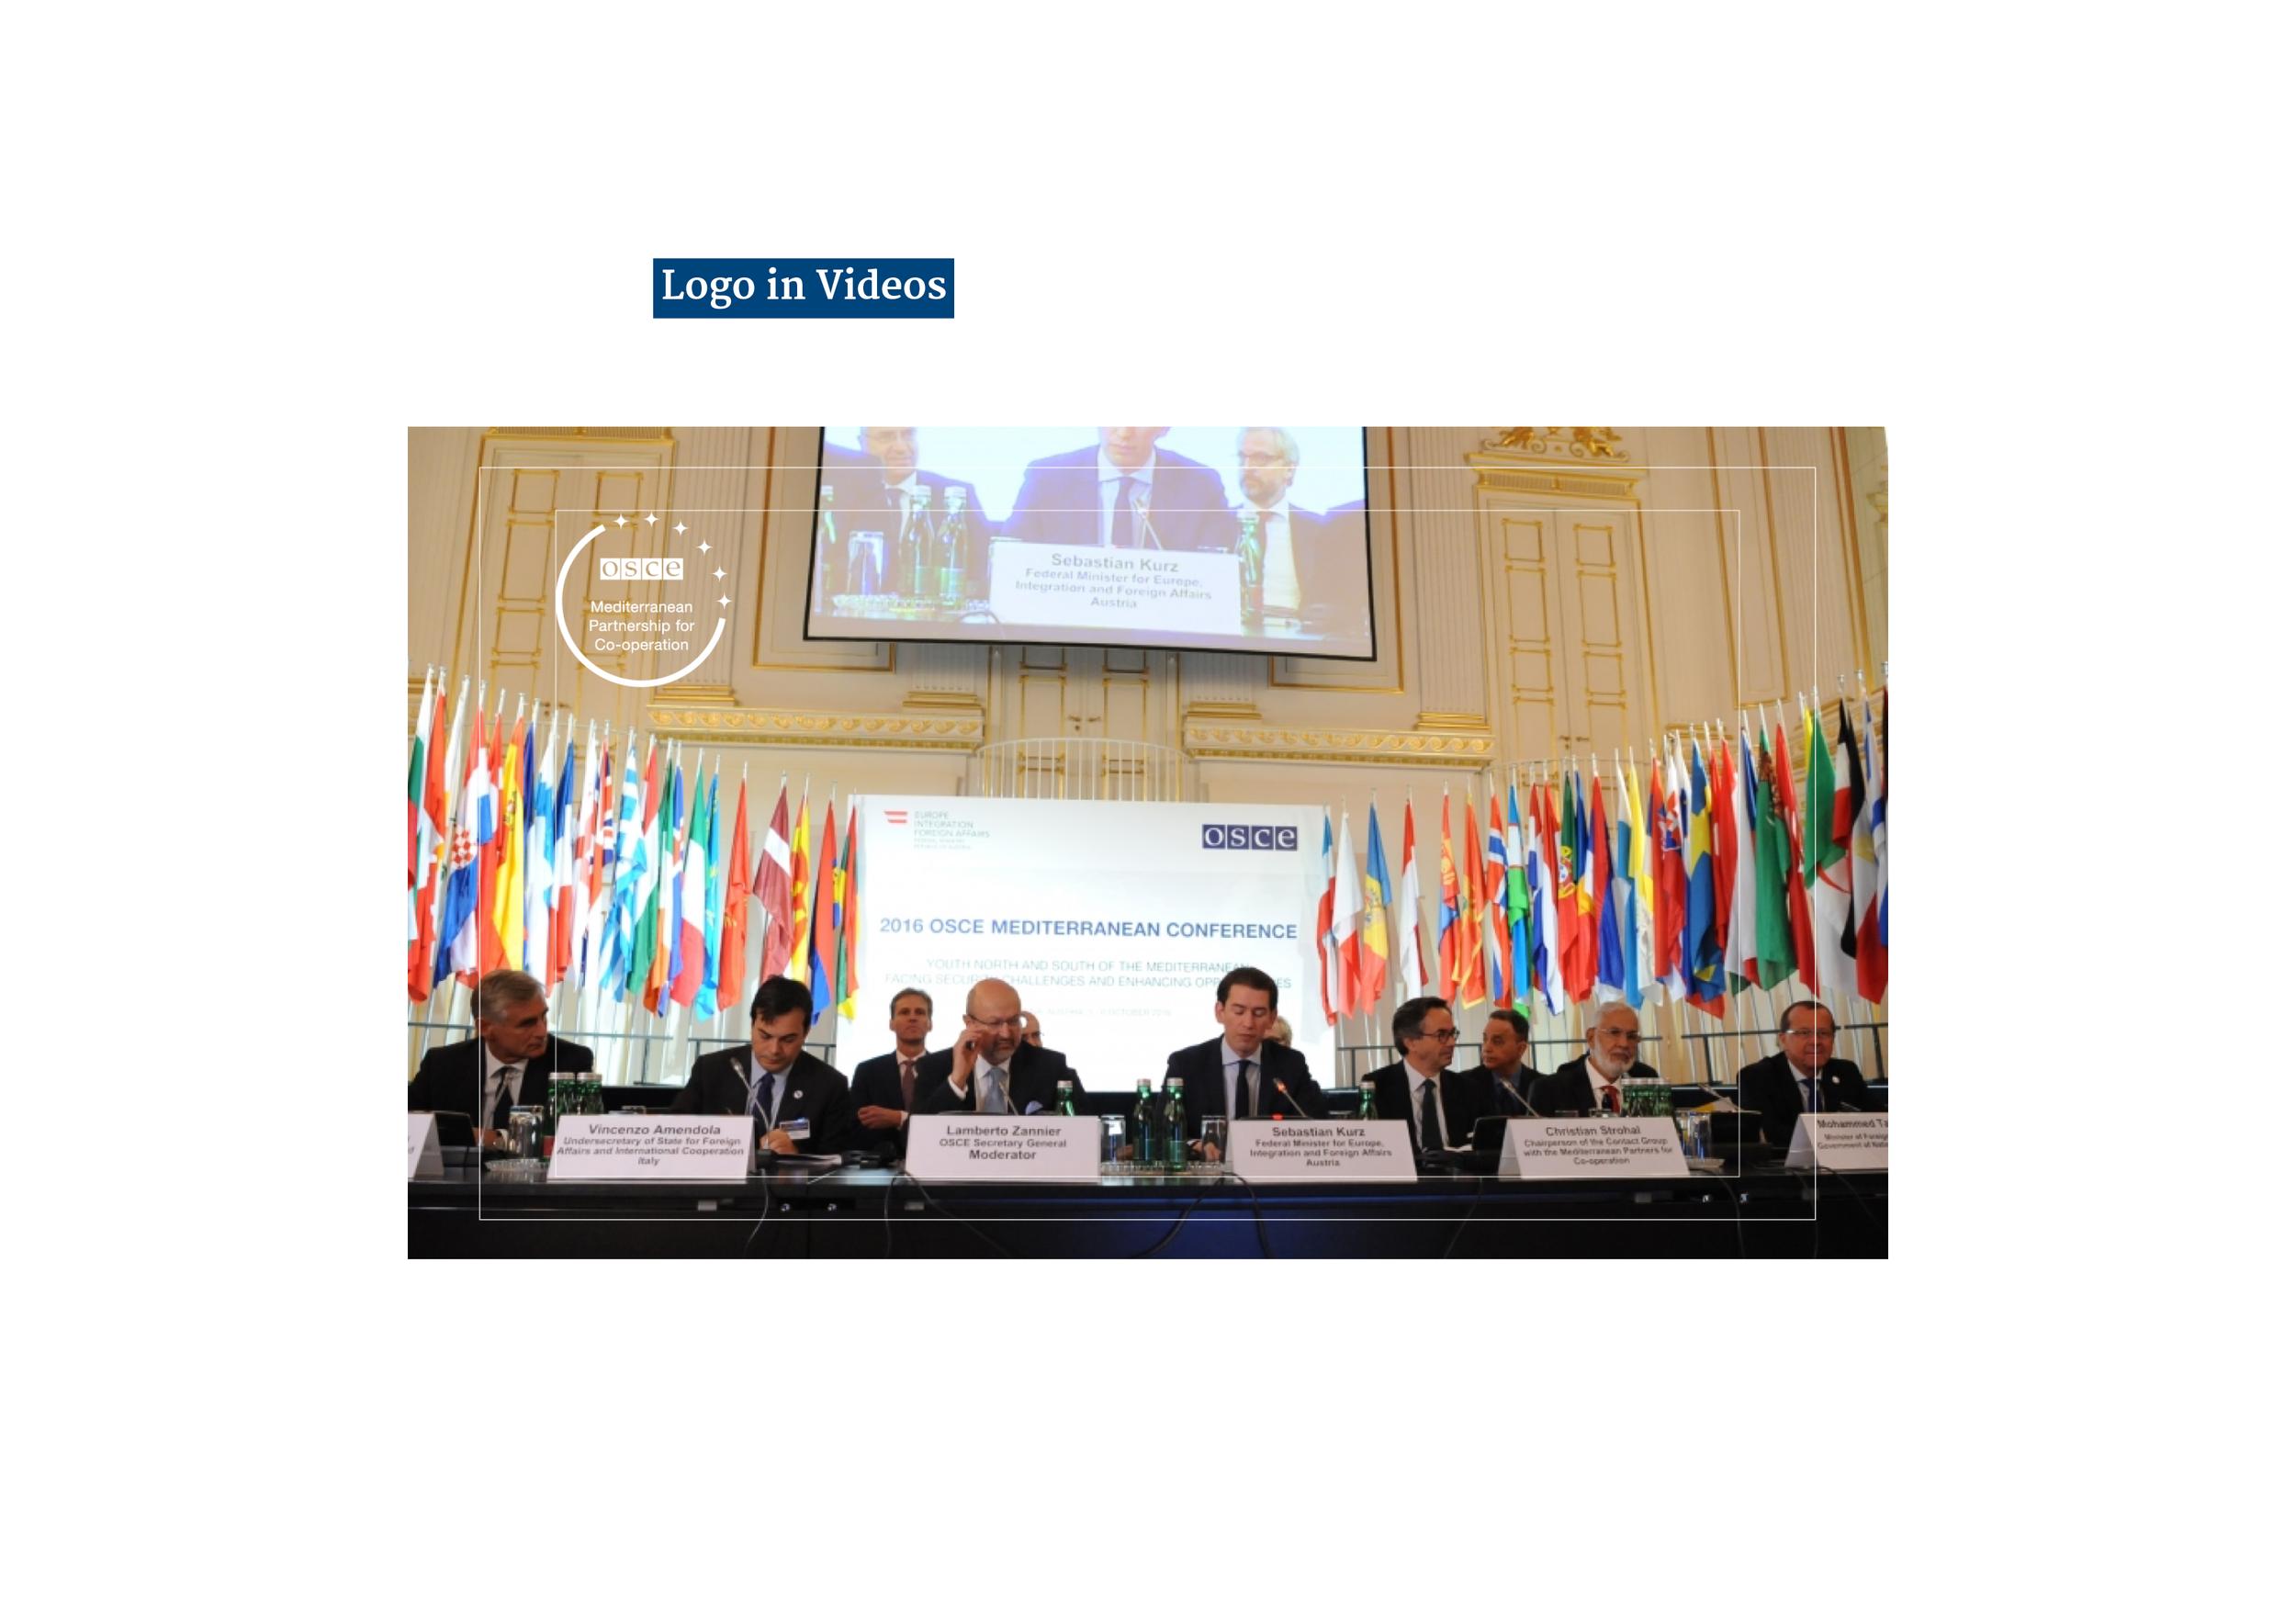 OSCE_Partnership_Logo_Graphic_Charter_31101620.png